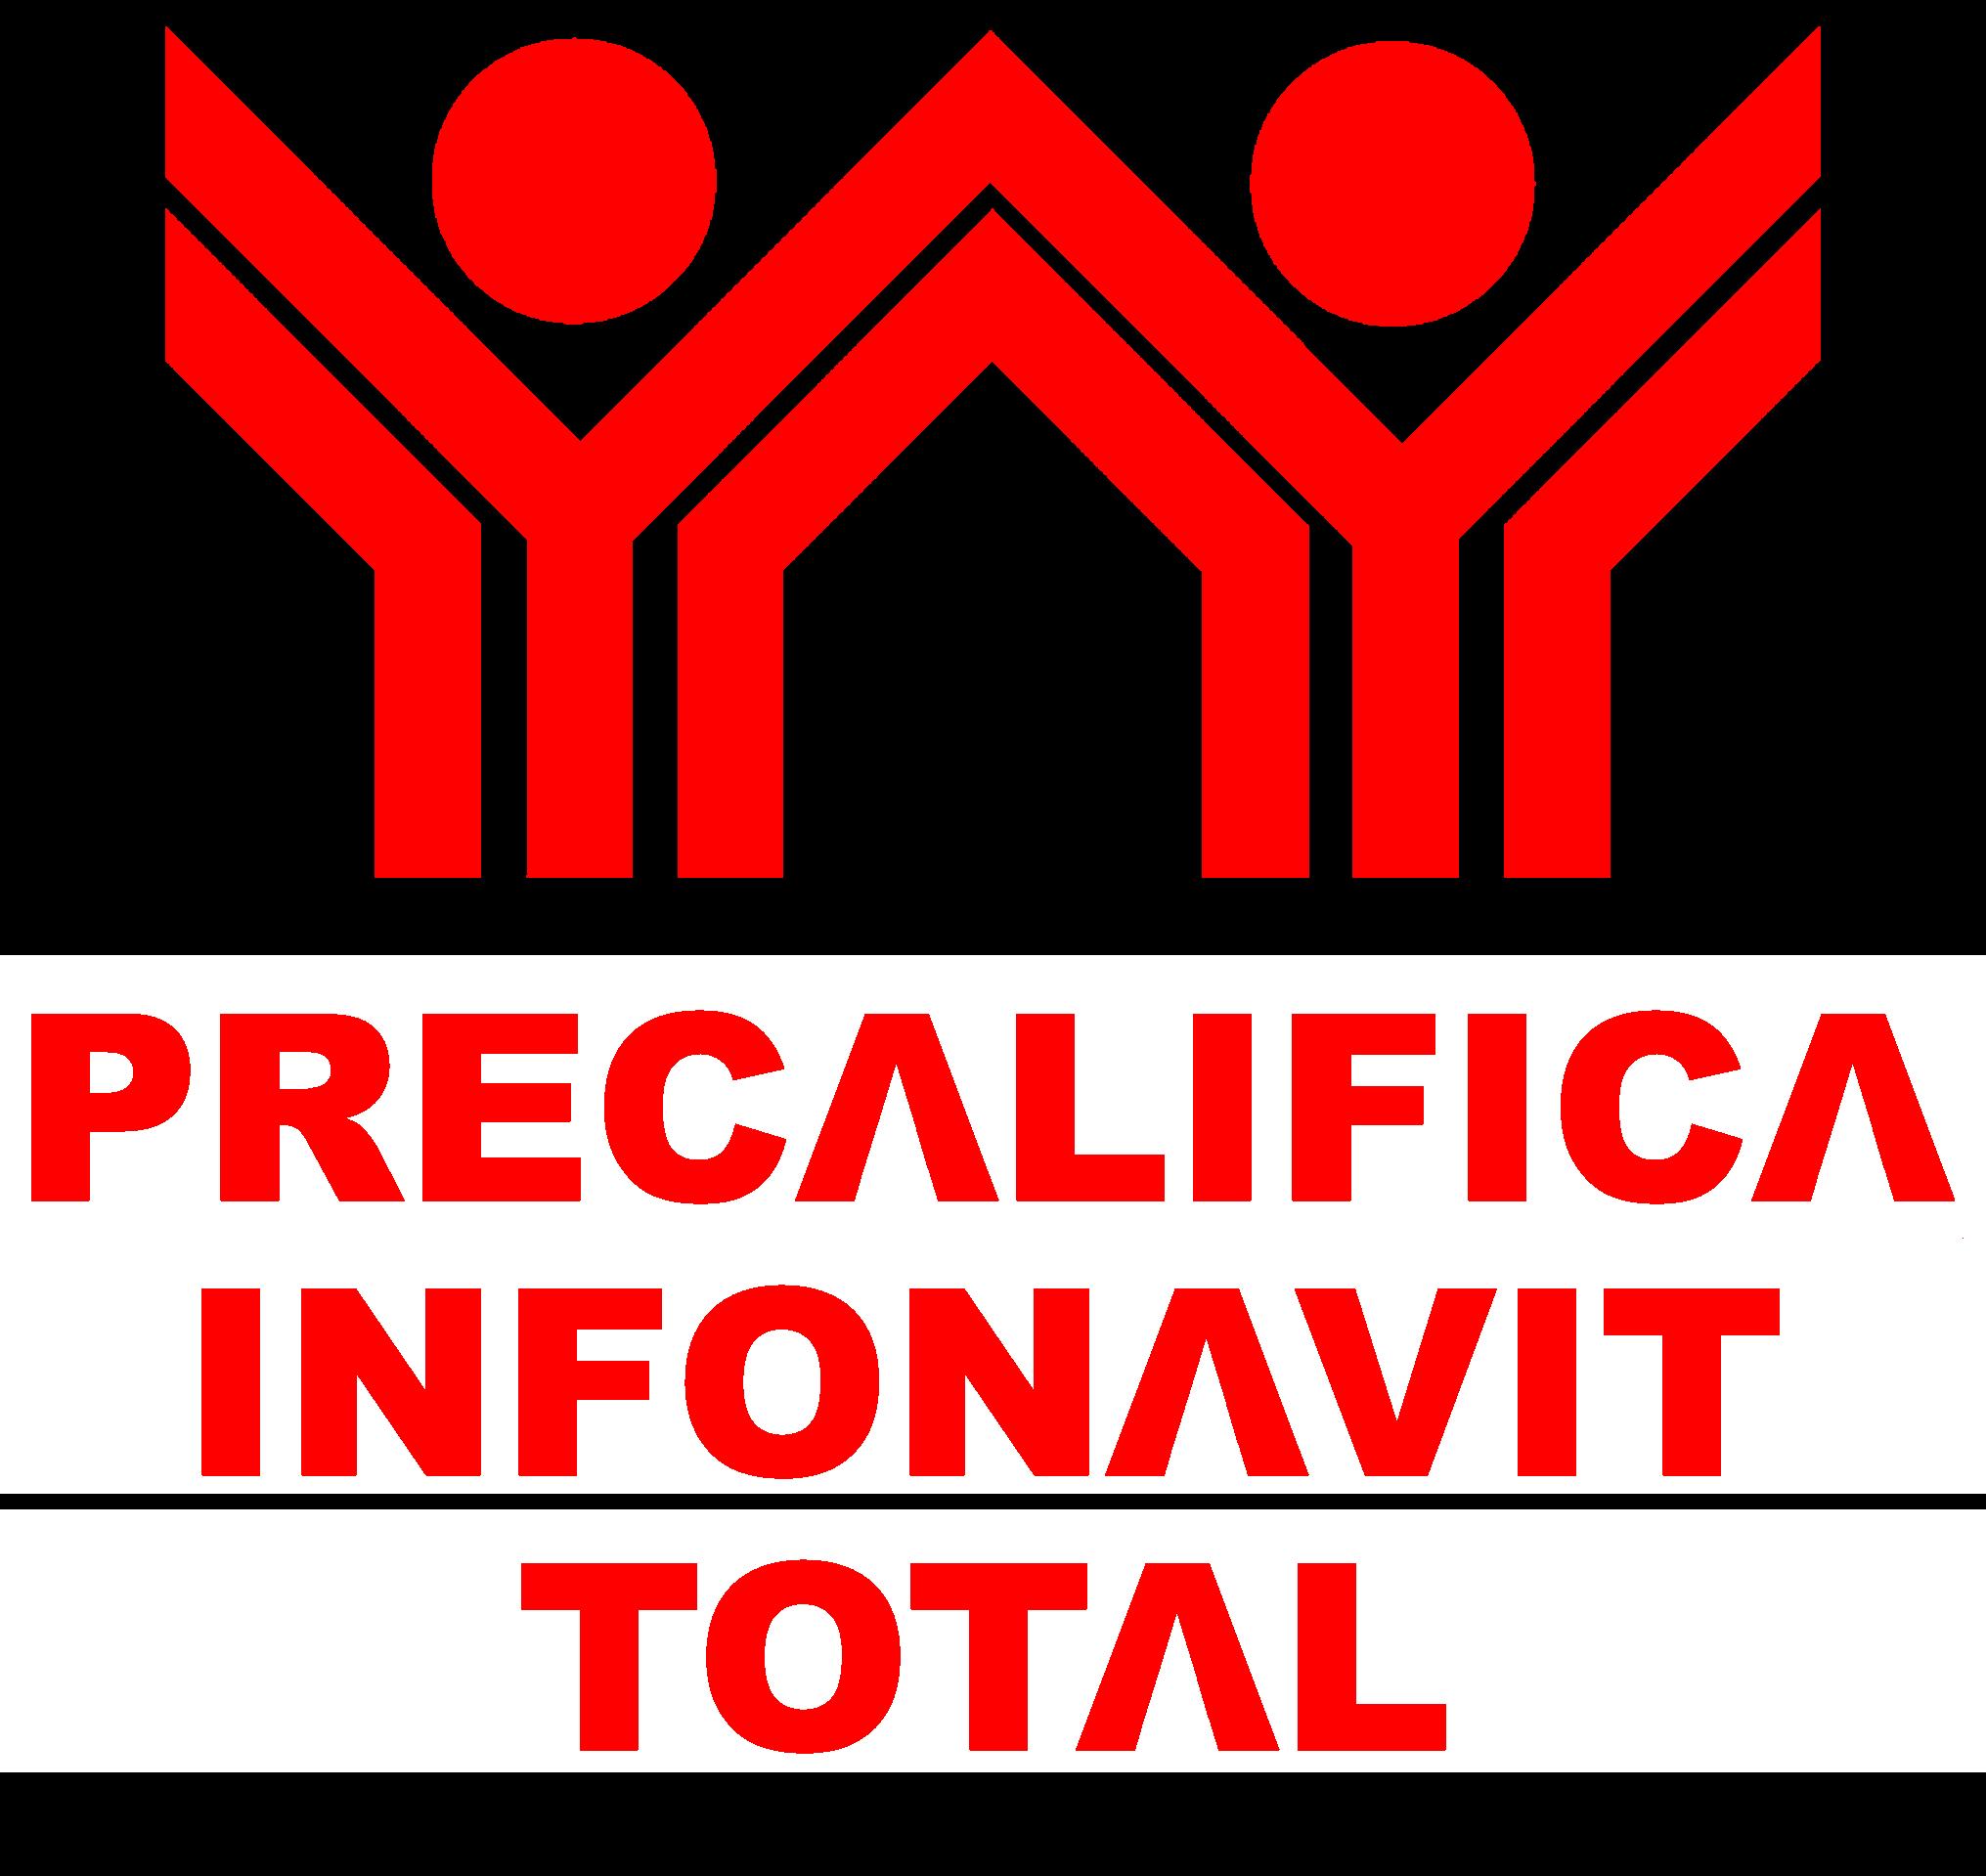 PRECALIFICACION INFONAVIT TOTAL